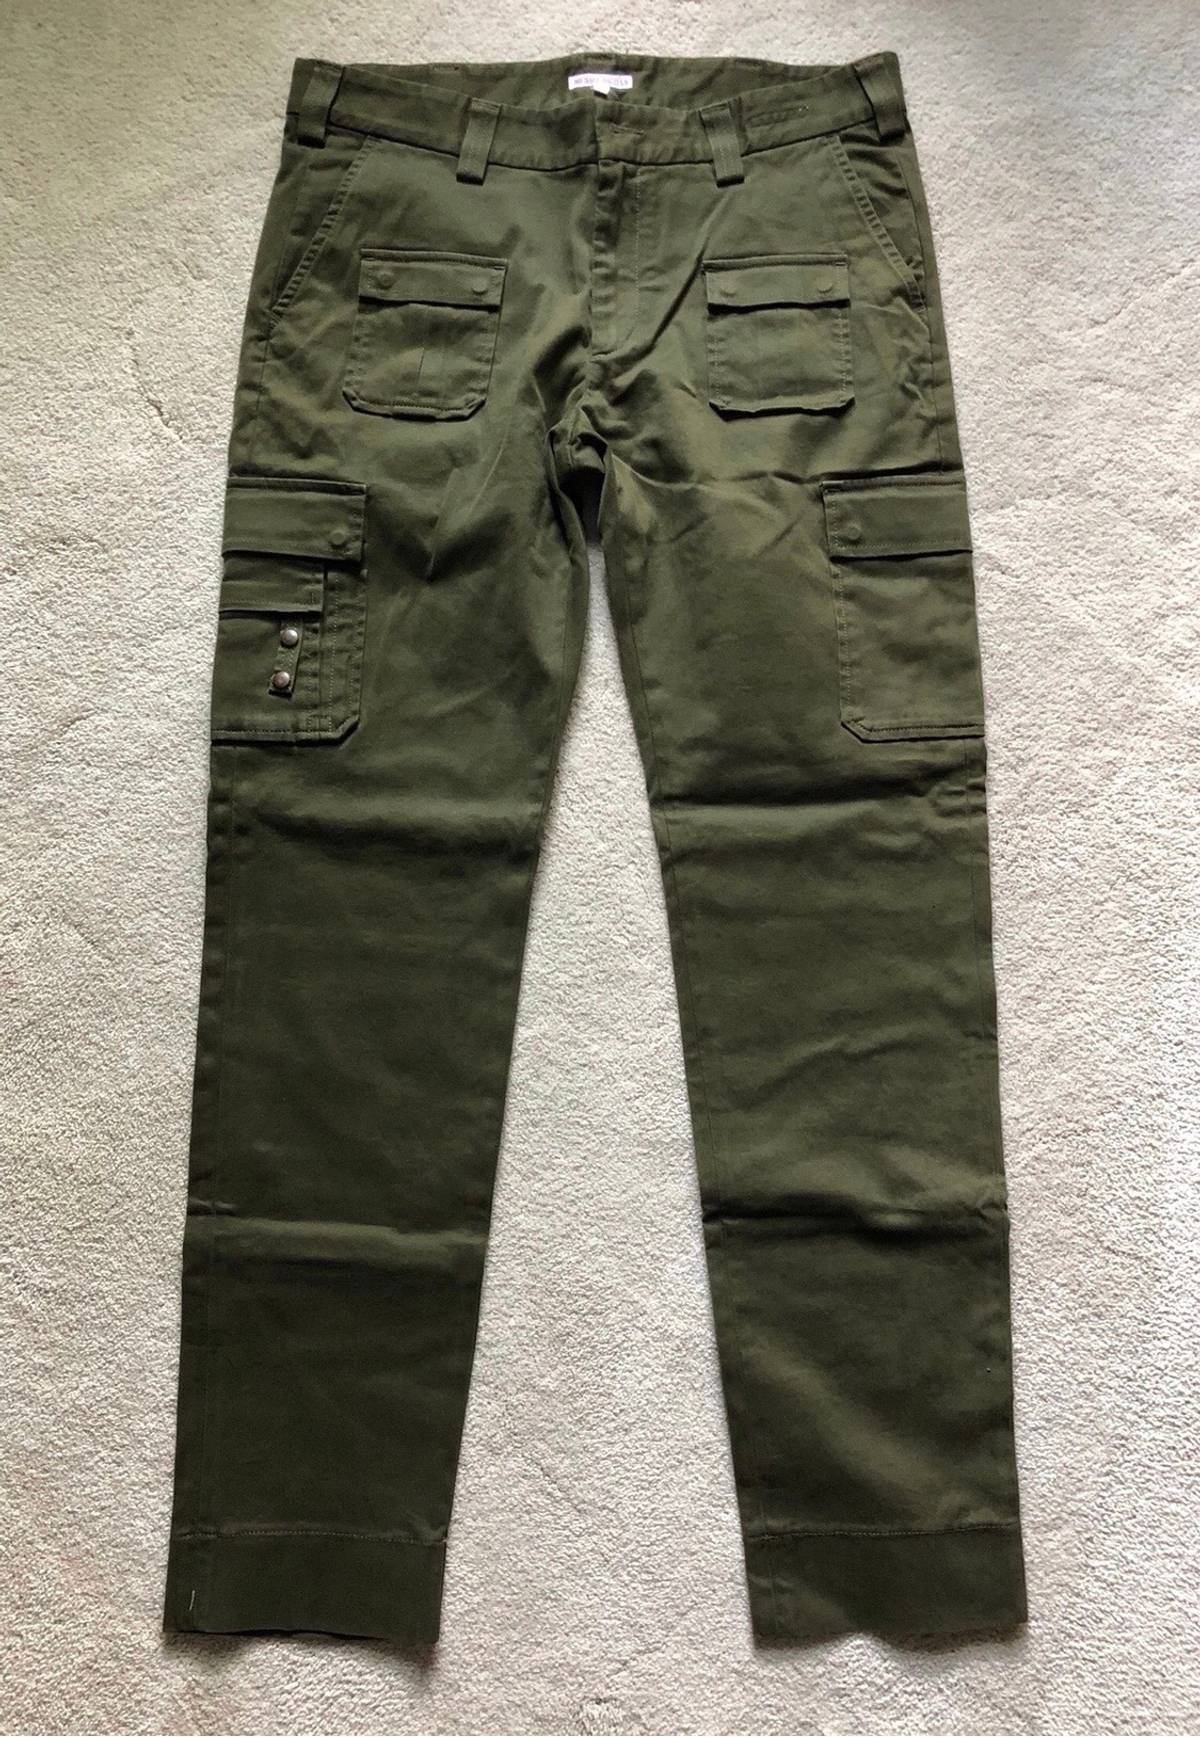 Michael Bastian Police Cargo Pants Size 34 - Casual Pants for Sale ... 34321cc79e5